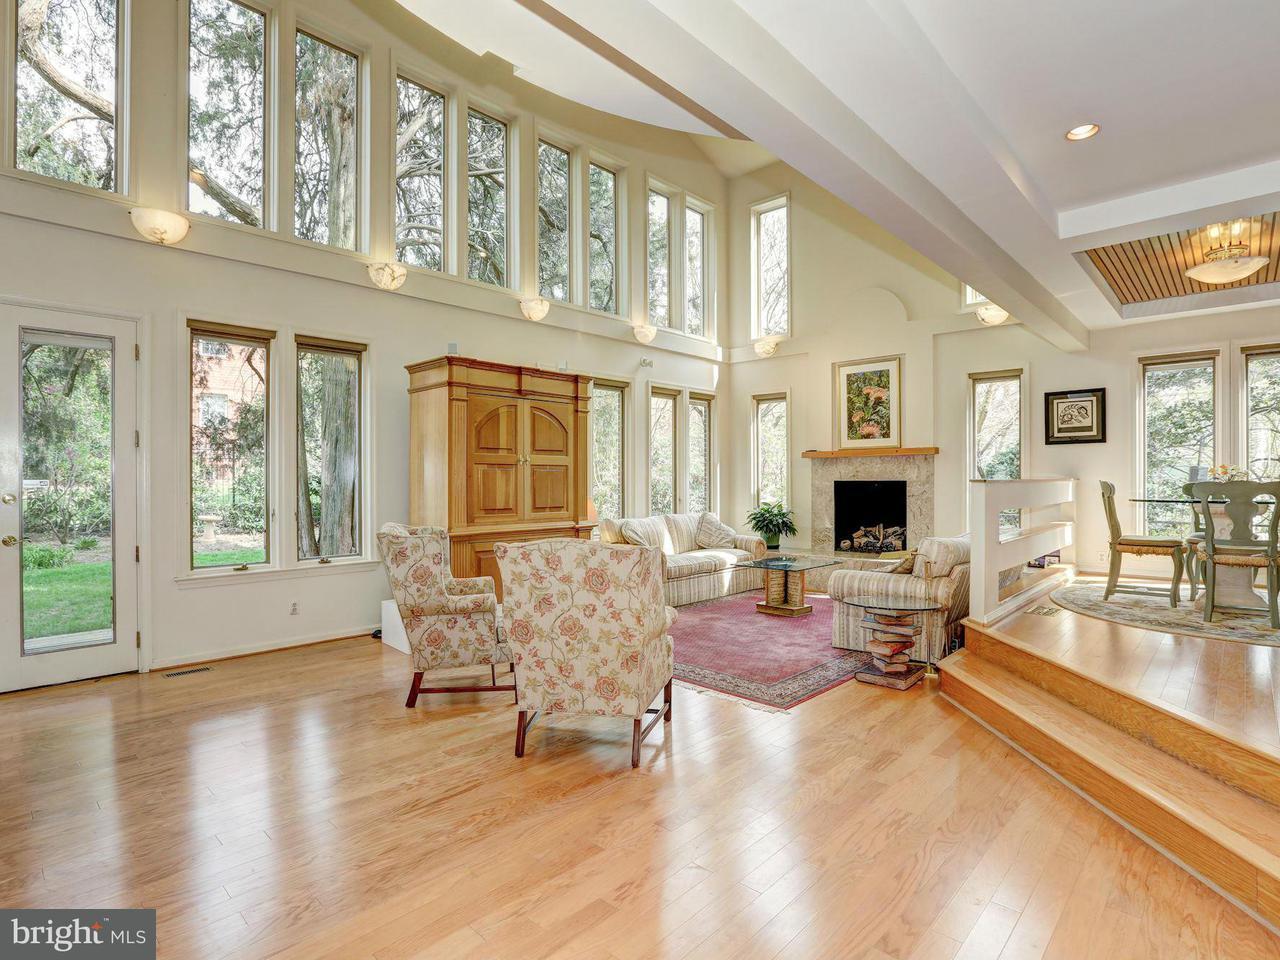 Single Family Home for Sale at 239 BARTON ST N 239 BARTON ST N Arlington, Virginia 22201 United States